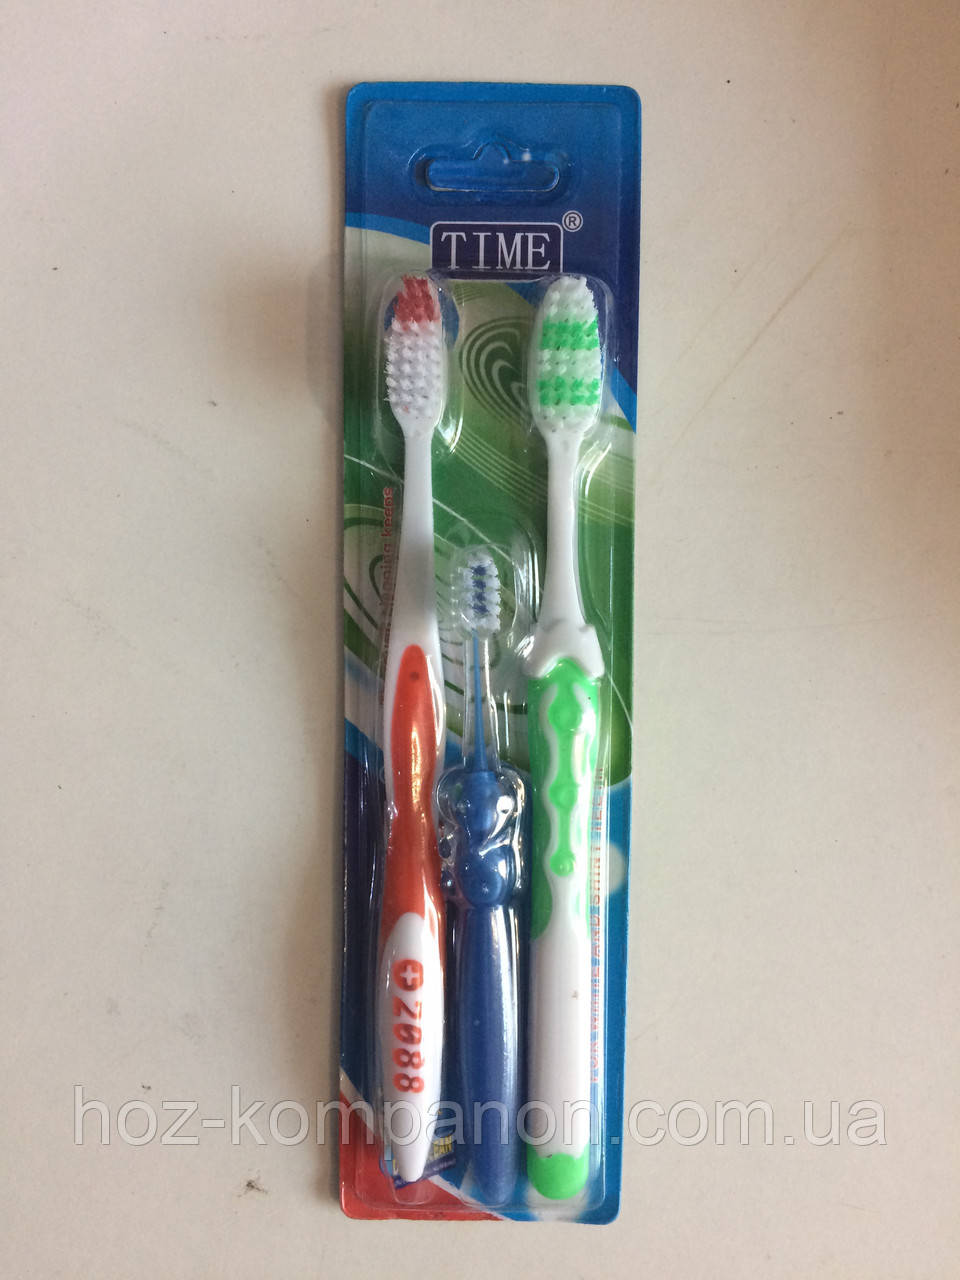 Зубная щетка семейная